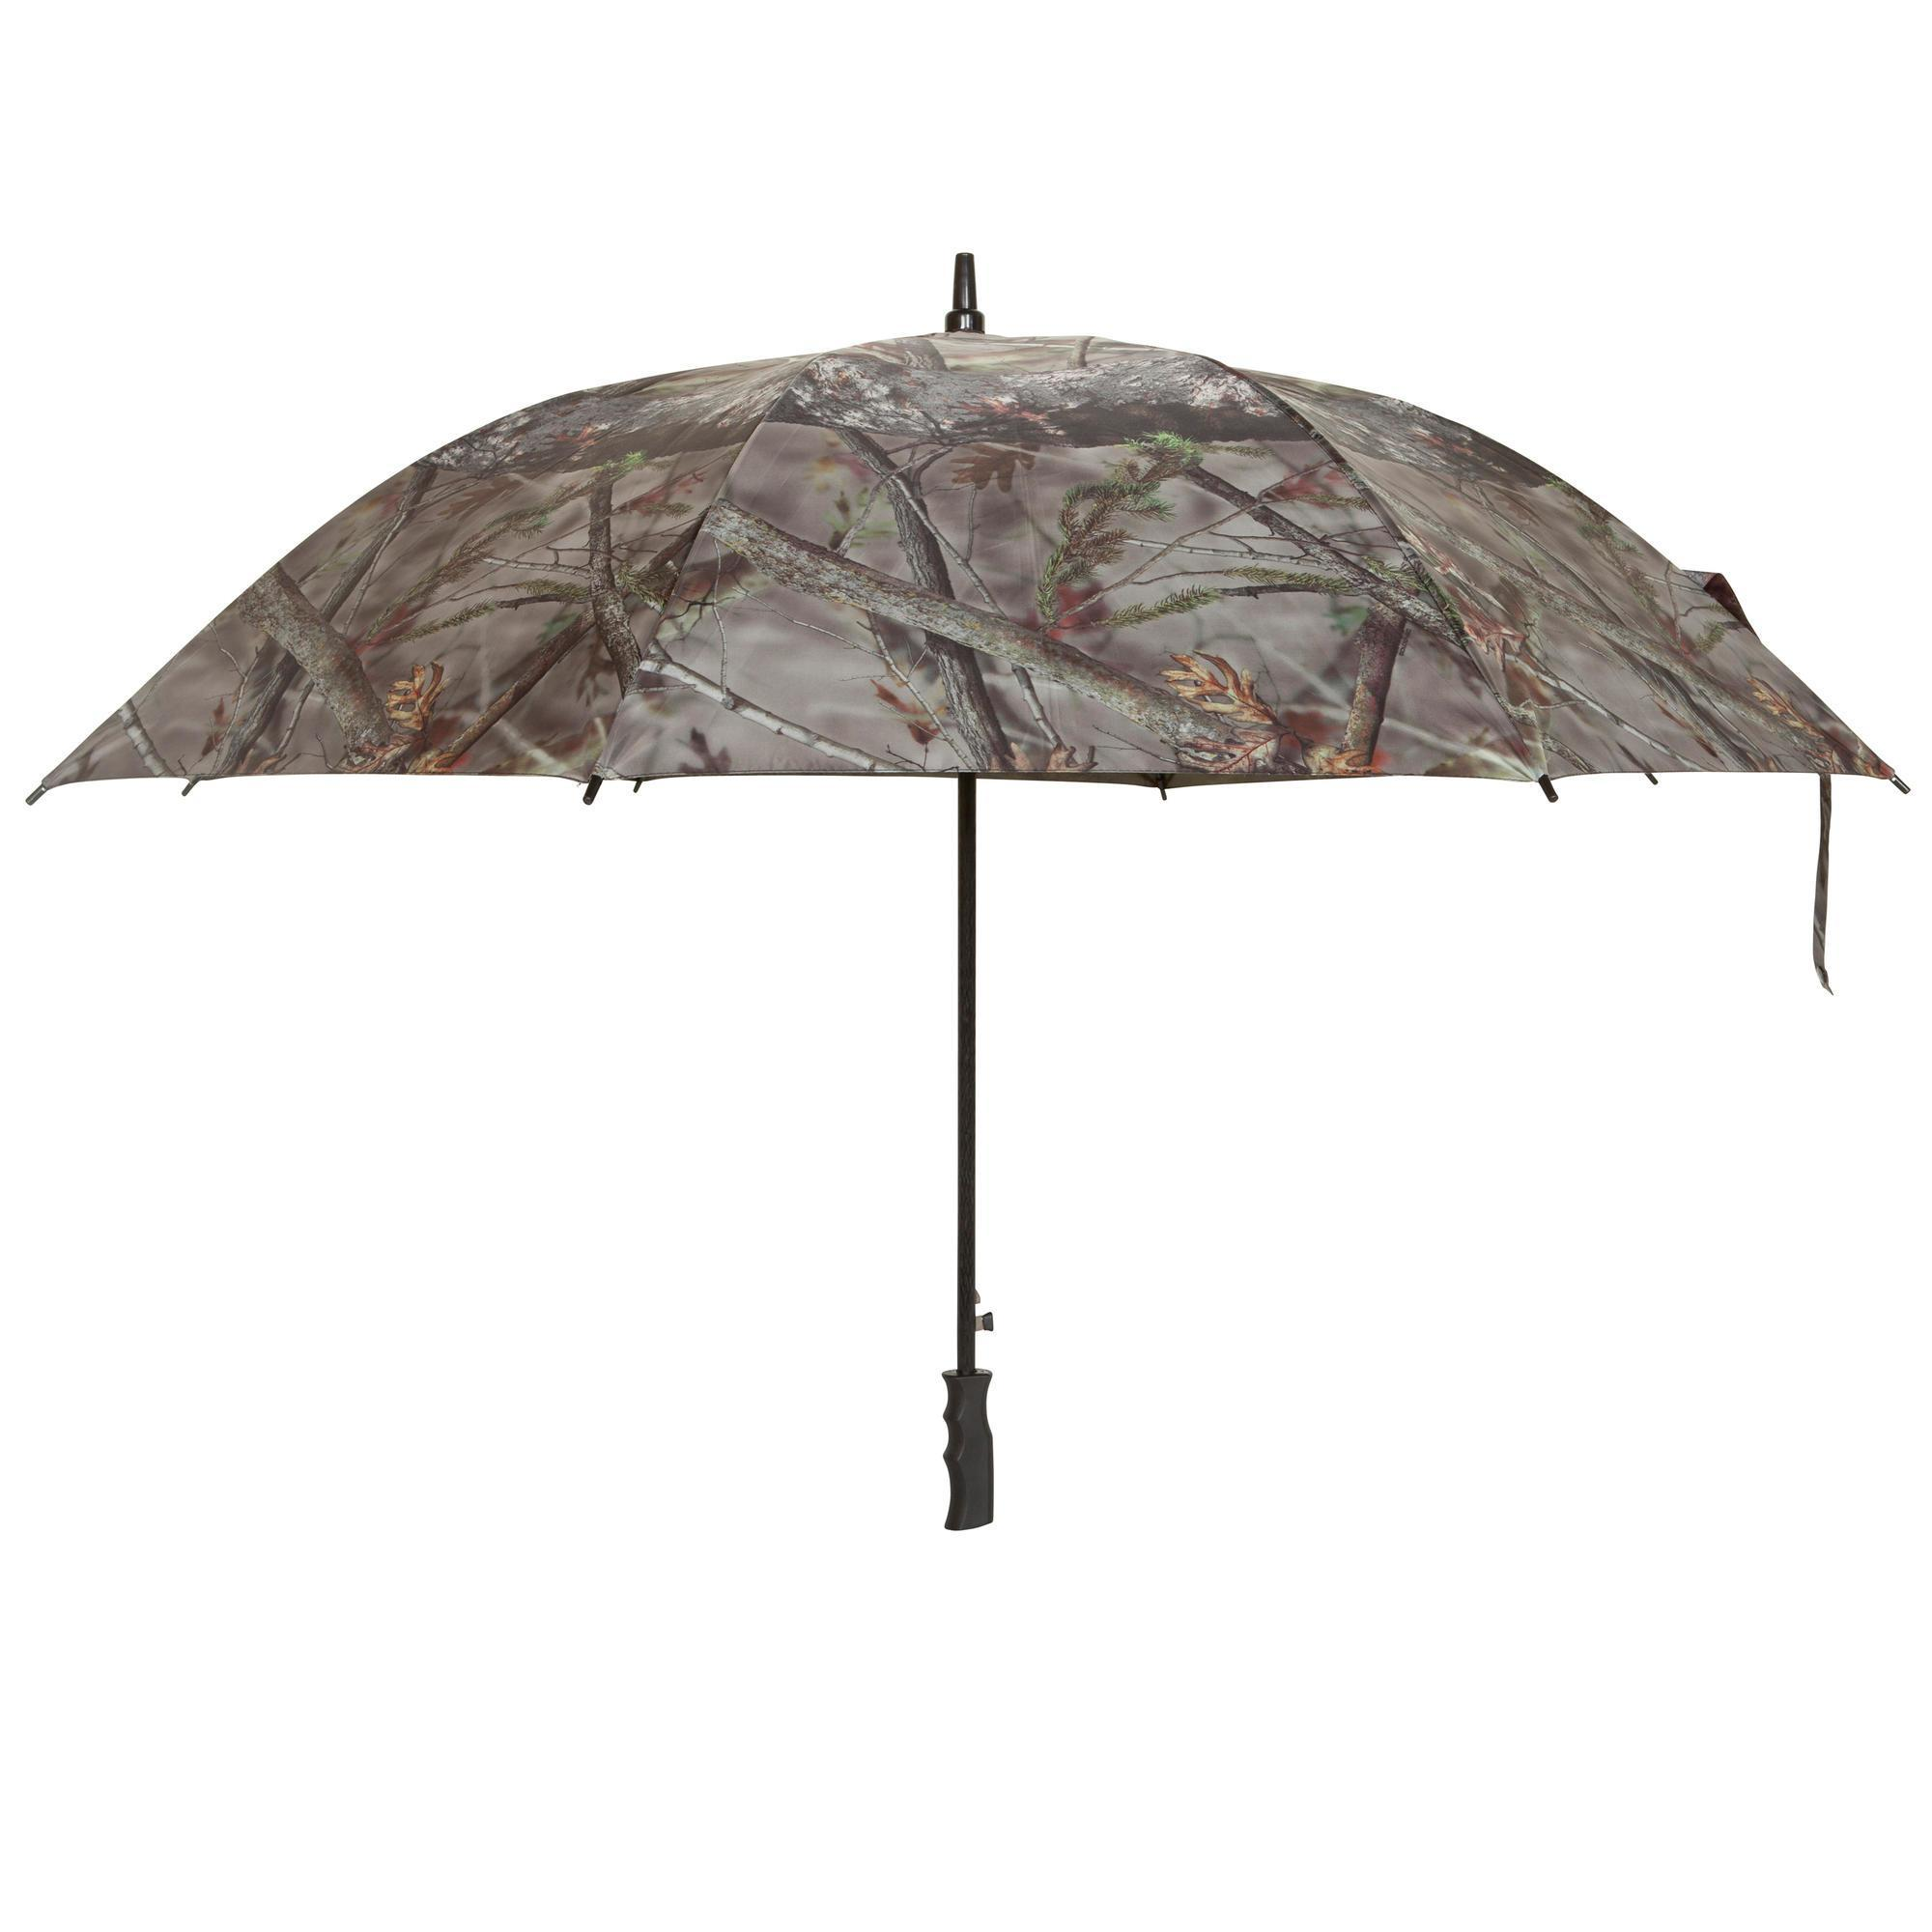 Damen,Herren,Jungen,Kinder Jagd-Regenschirm Camouflage braun | 03583788869061